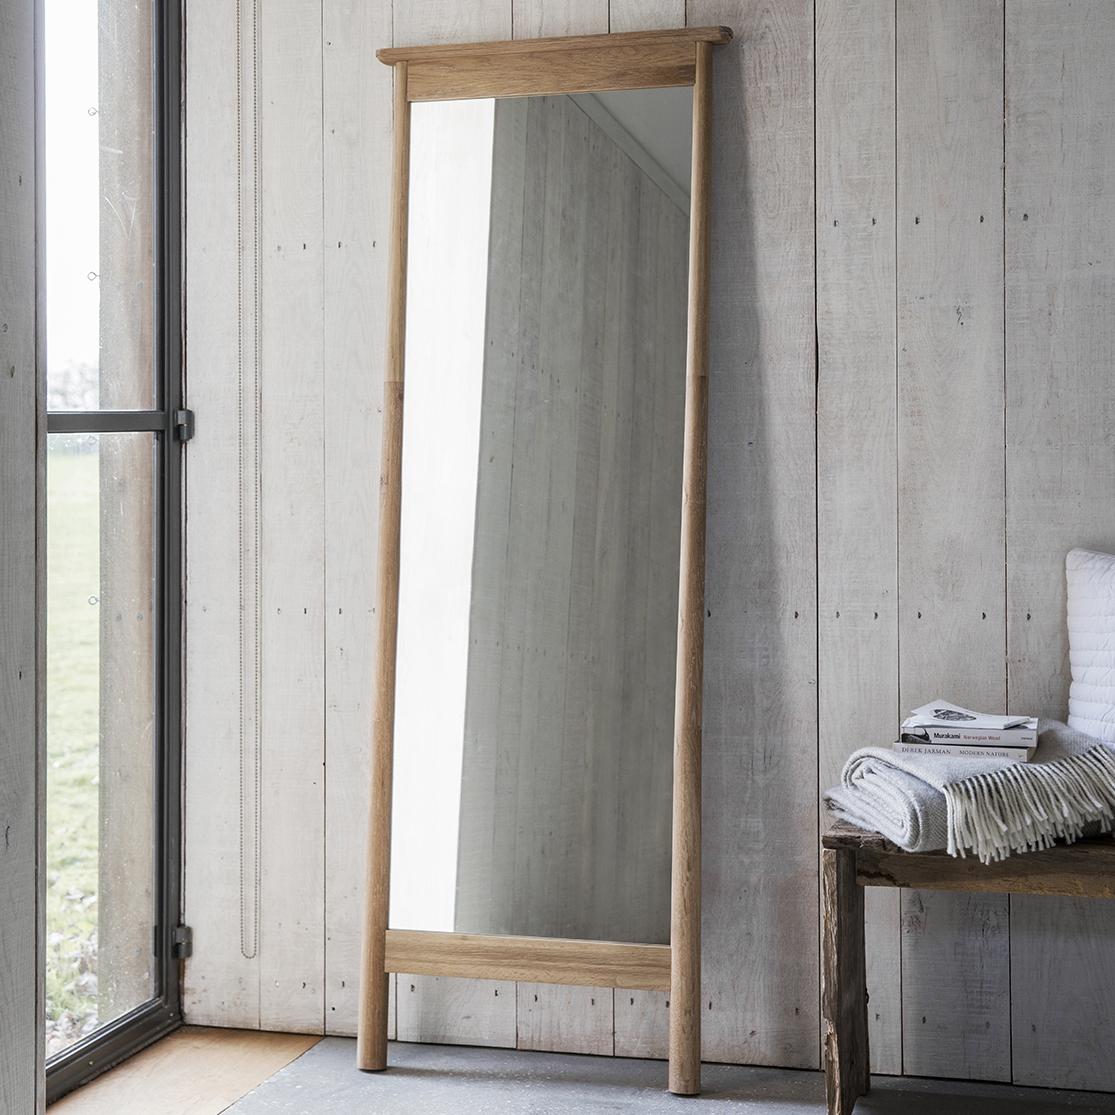 Wycombe mirror  - £367